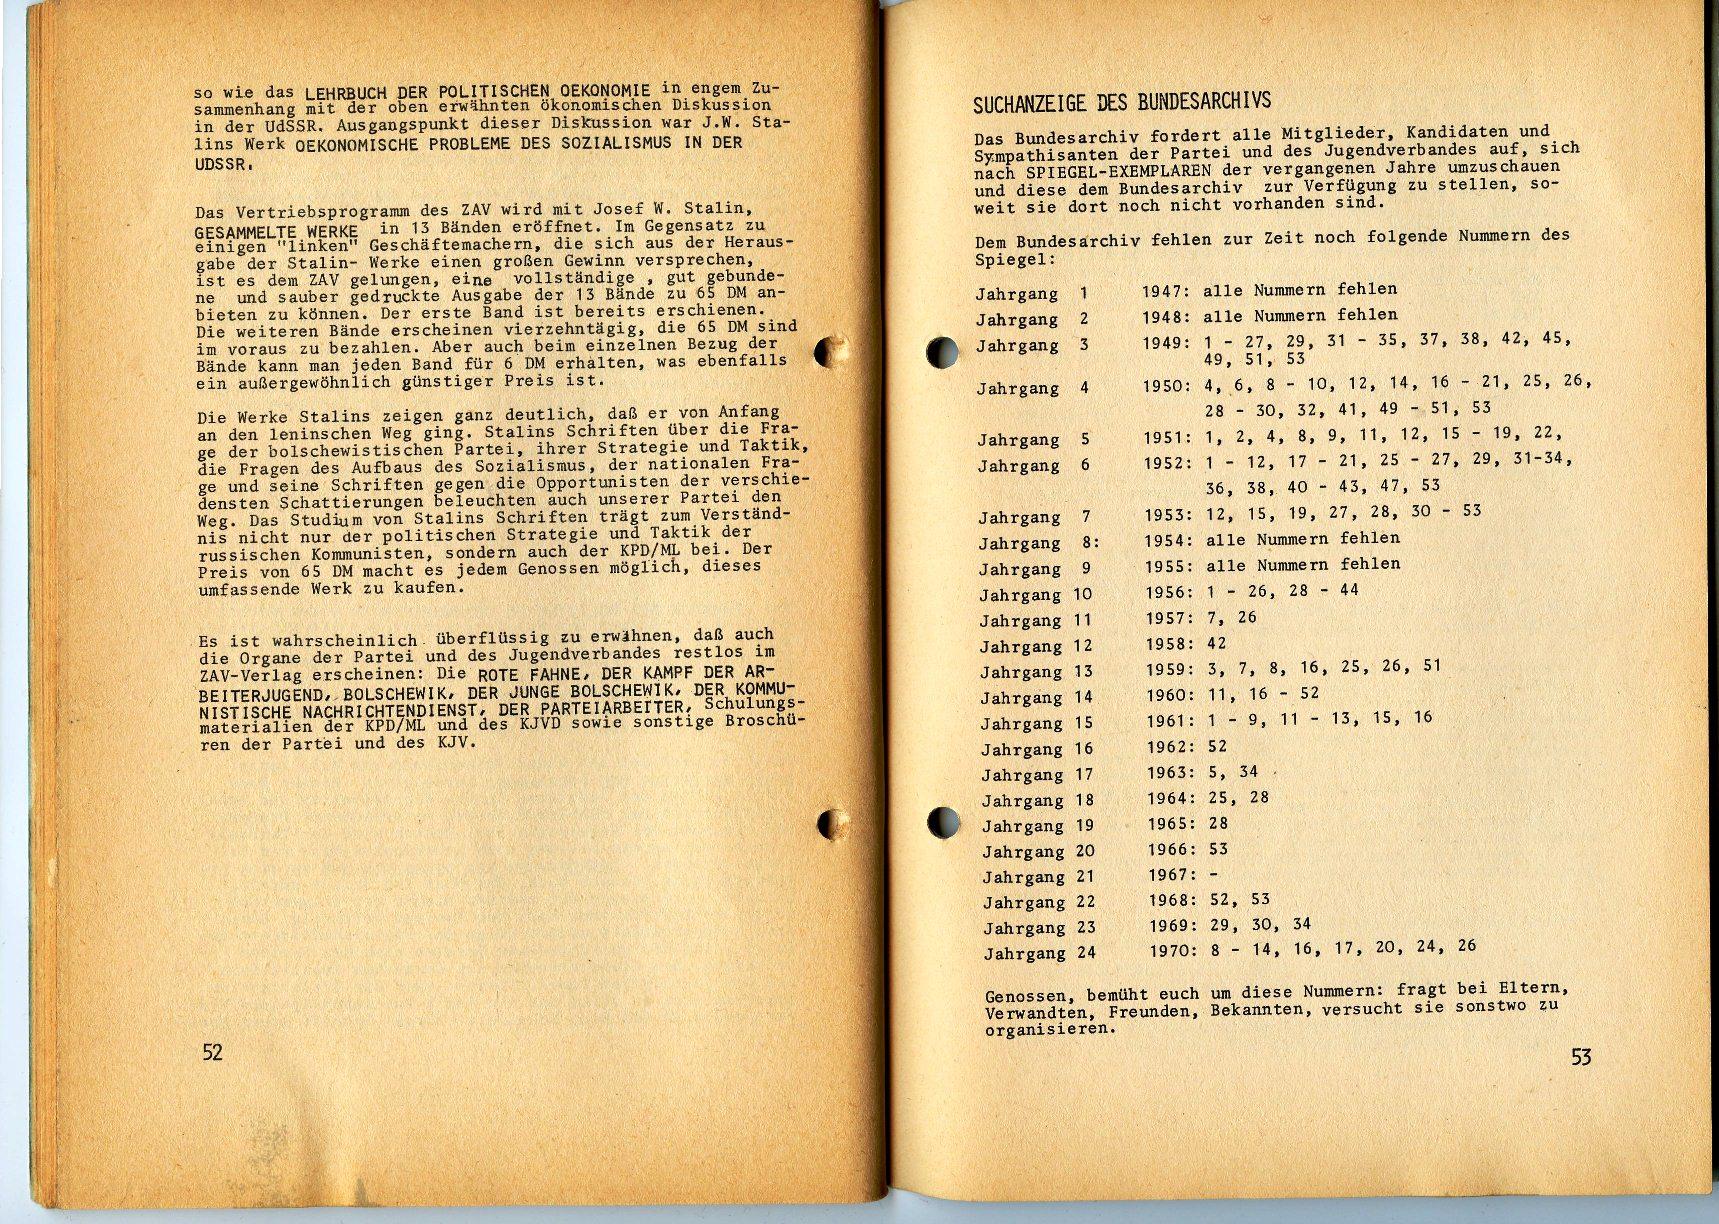 ZB_Parteiarbeiter_1971_04_27